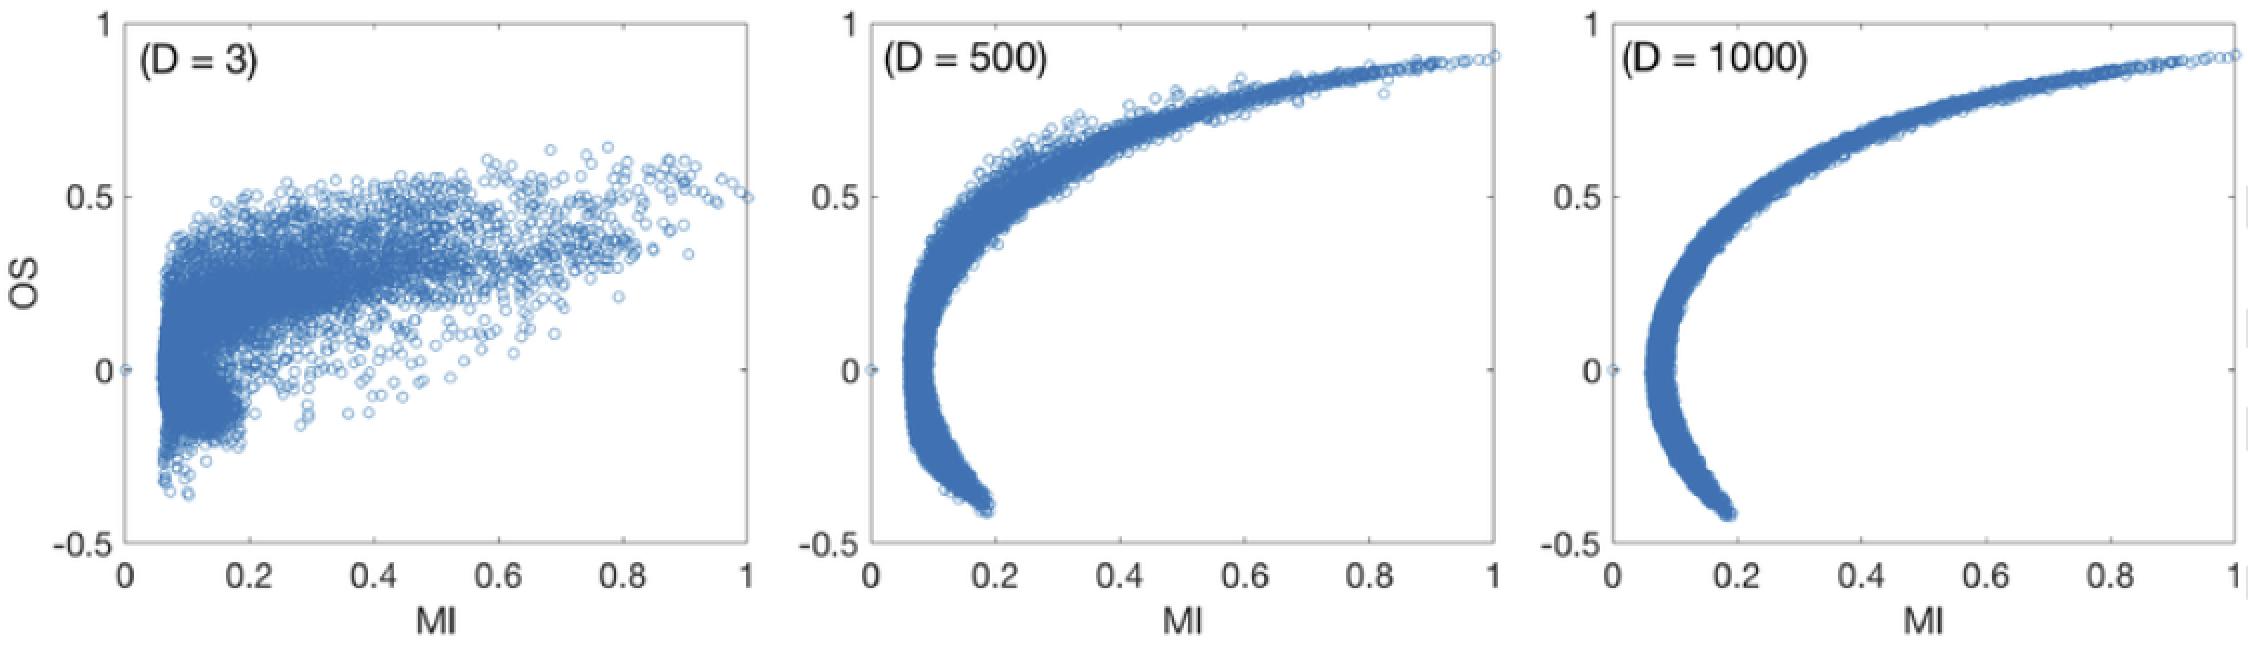 Ordinal synchronization comparison